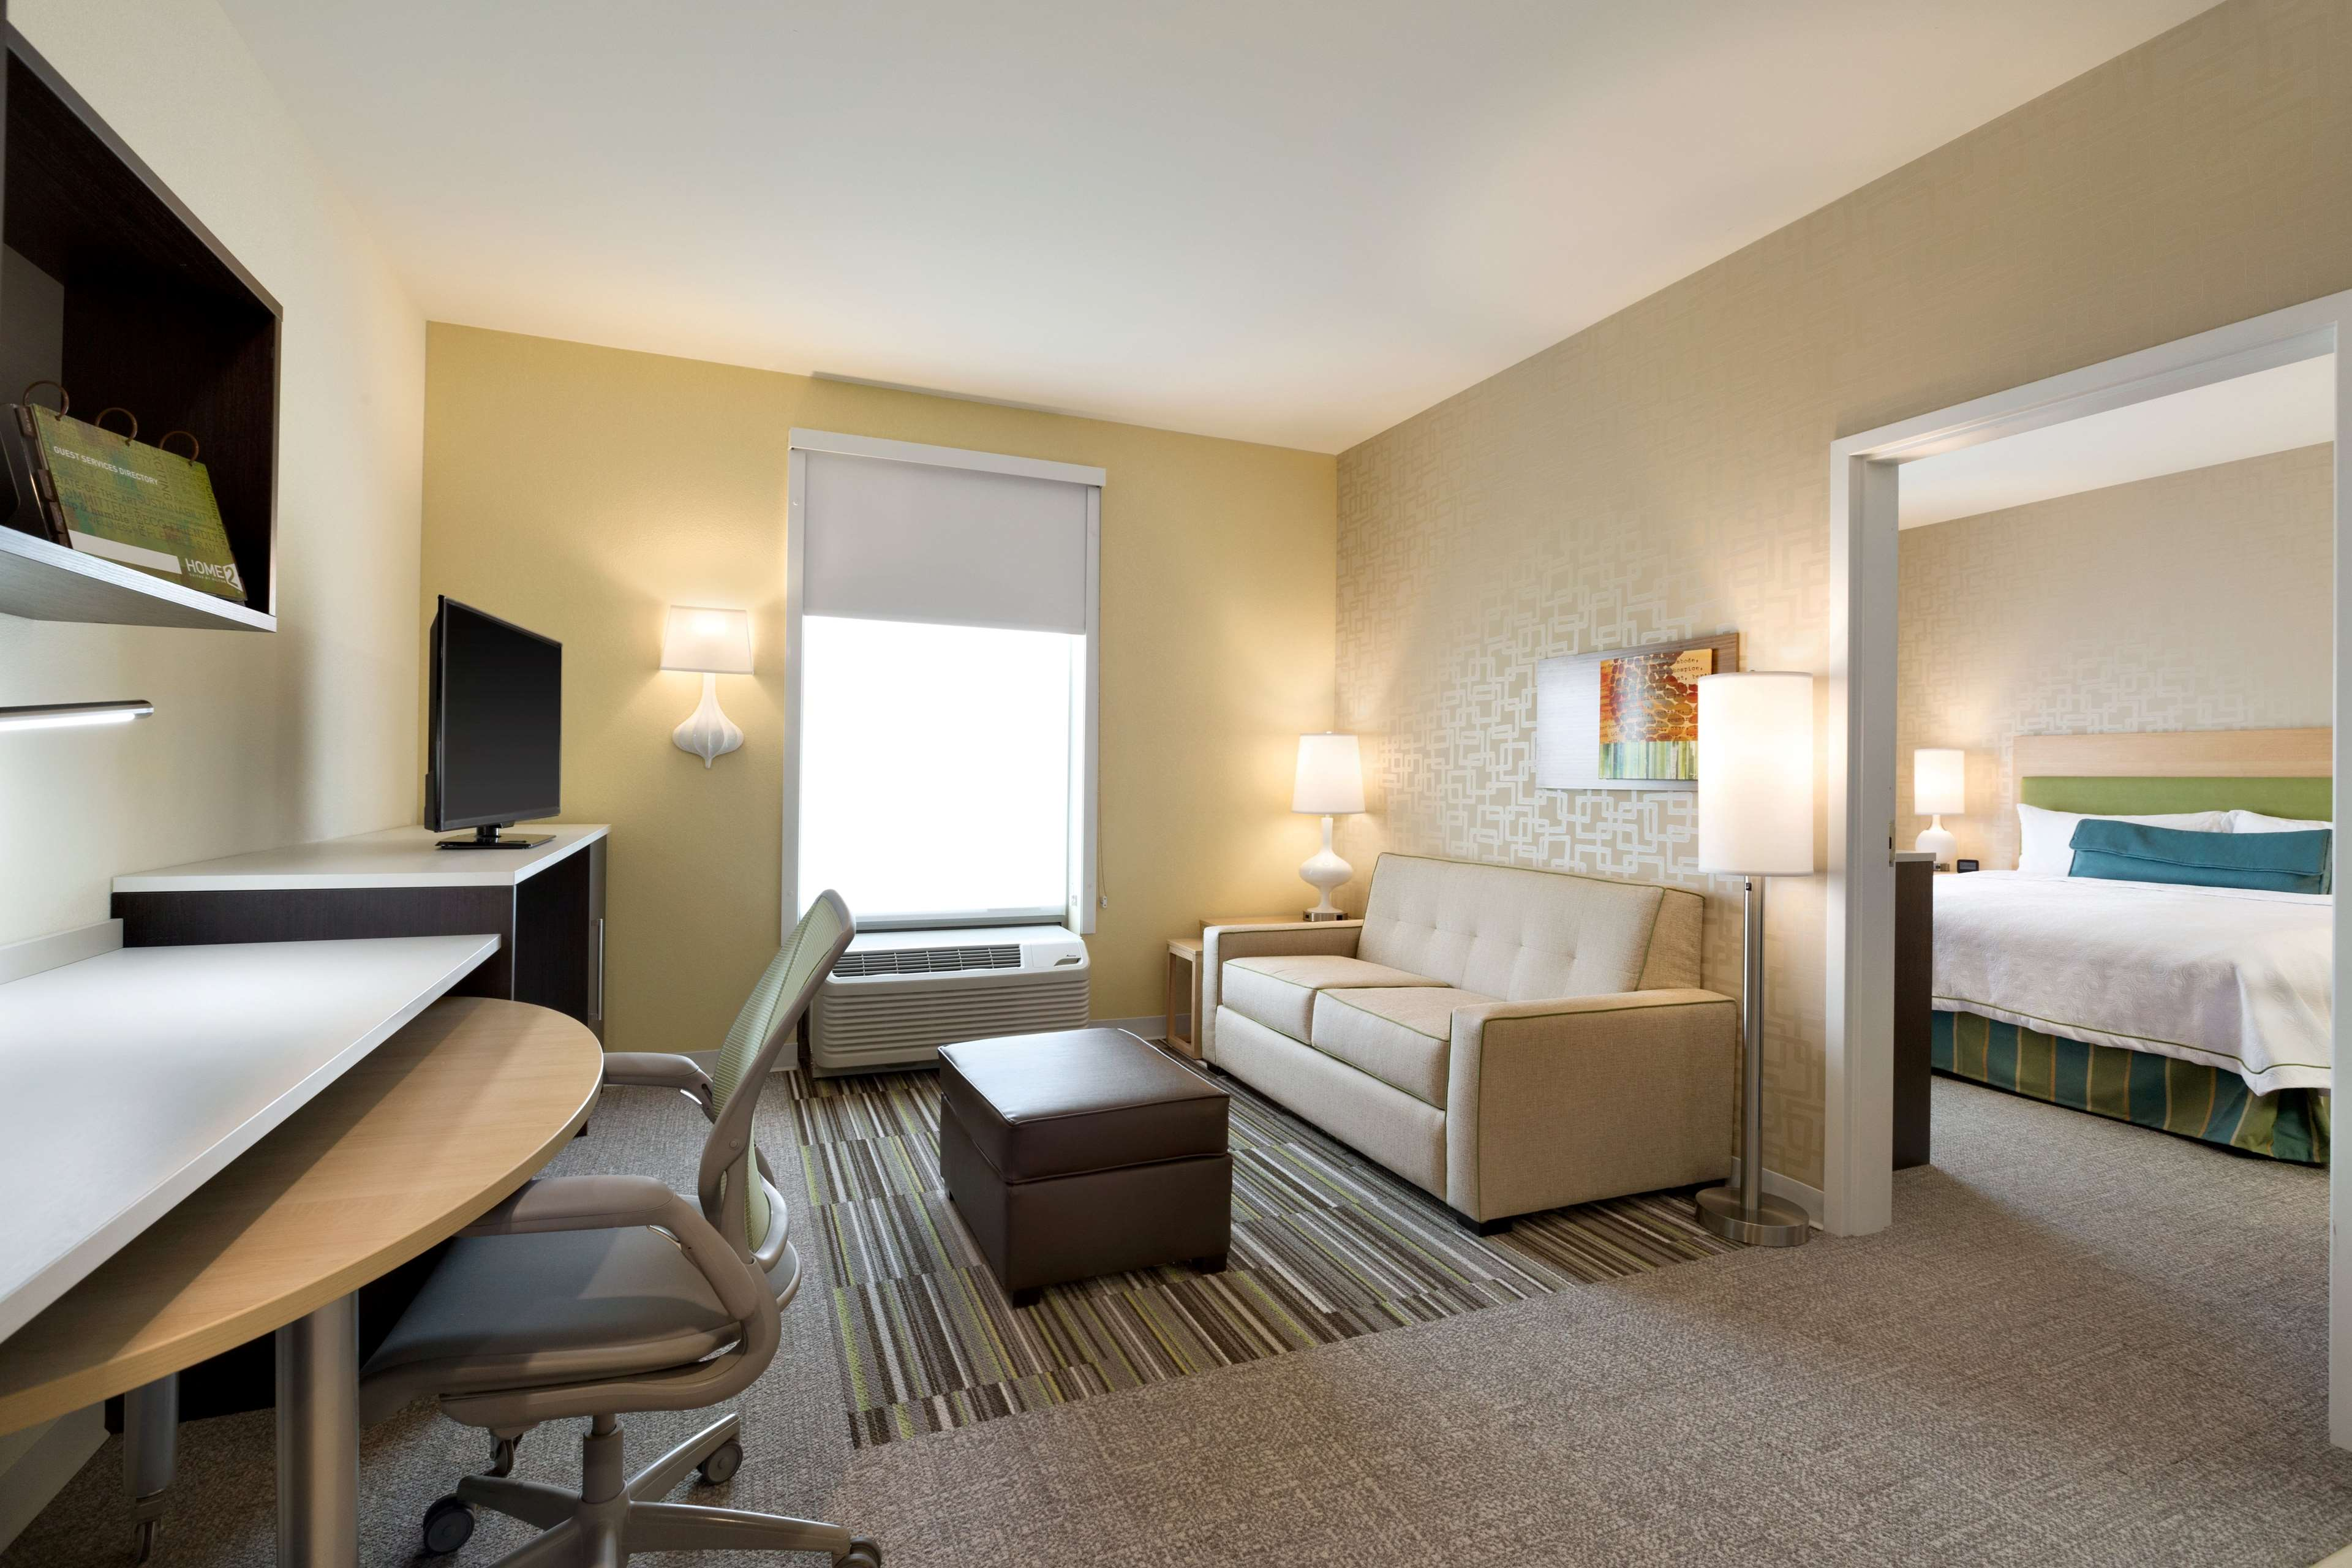 Home2 Suites by Hilton Cincinnati Liberty Township image 3